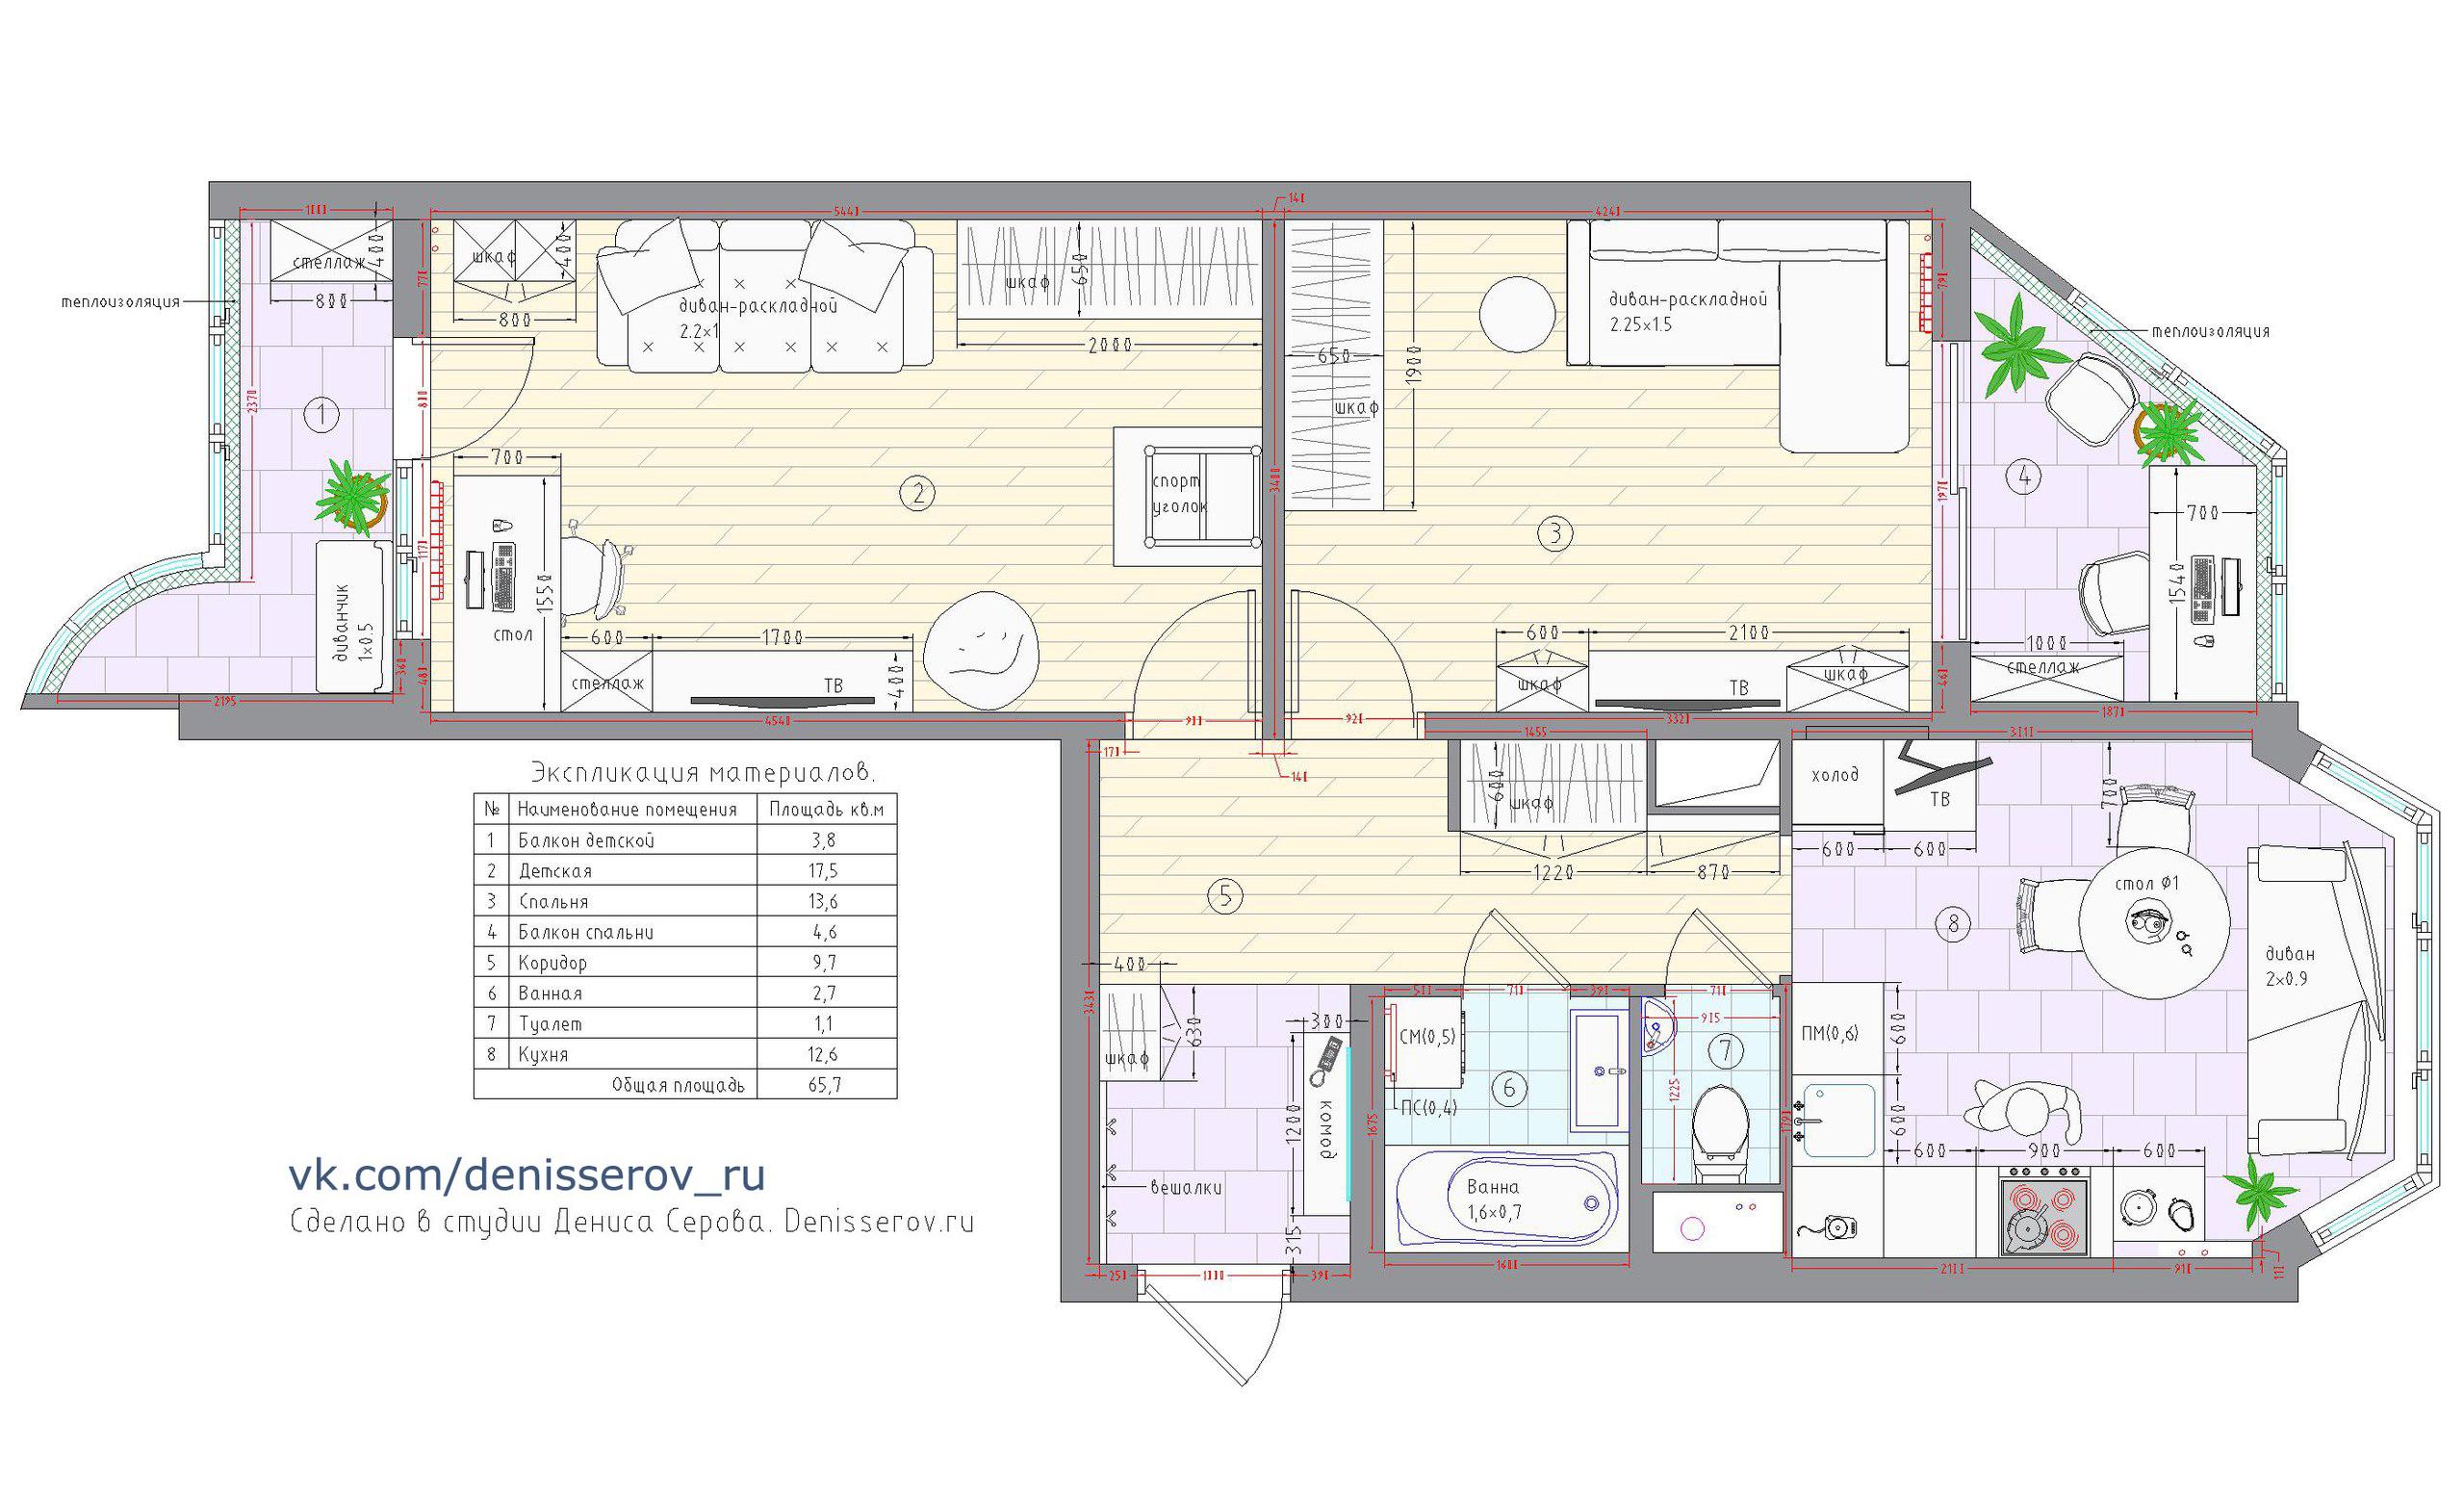 планировка двухкомнатной квартиры п-44т